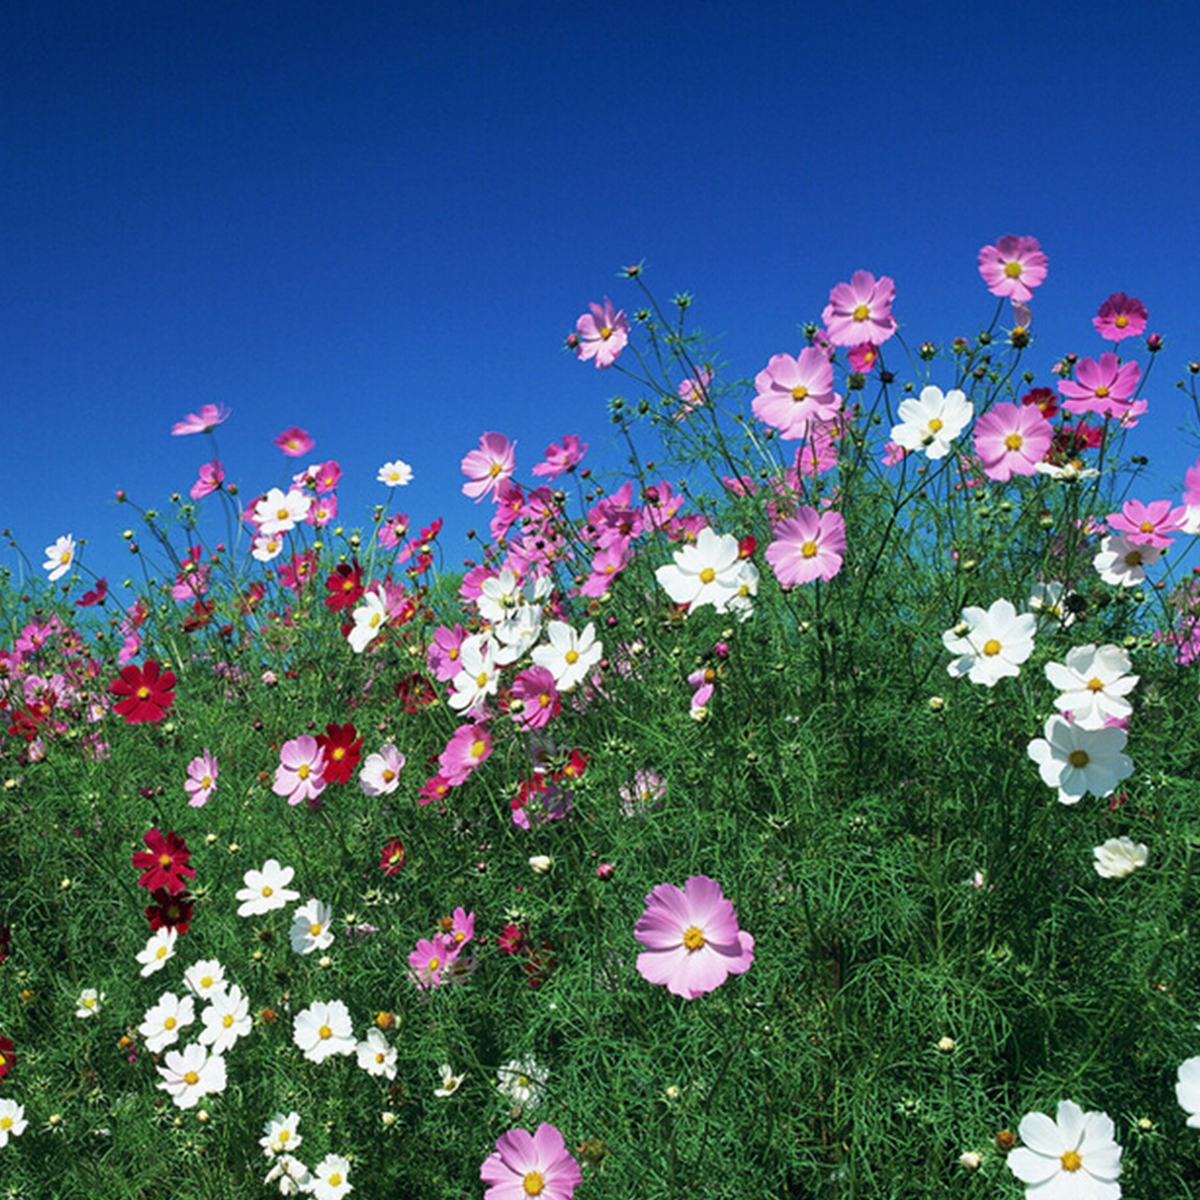 100 x cosmos bipinnatus perennial herbs garden park yard flower image is loading 100 x cosmos bipinnatus perennial herbs garden park izmirmasajfo